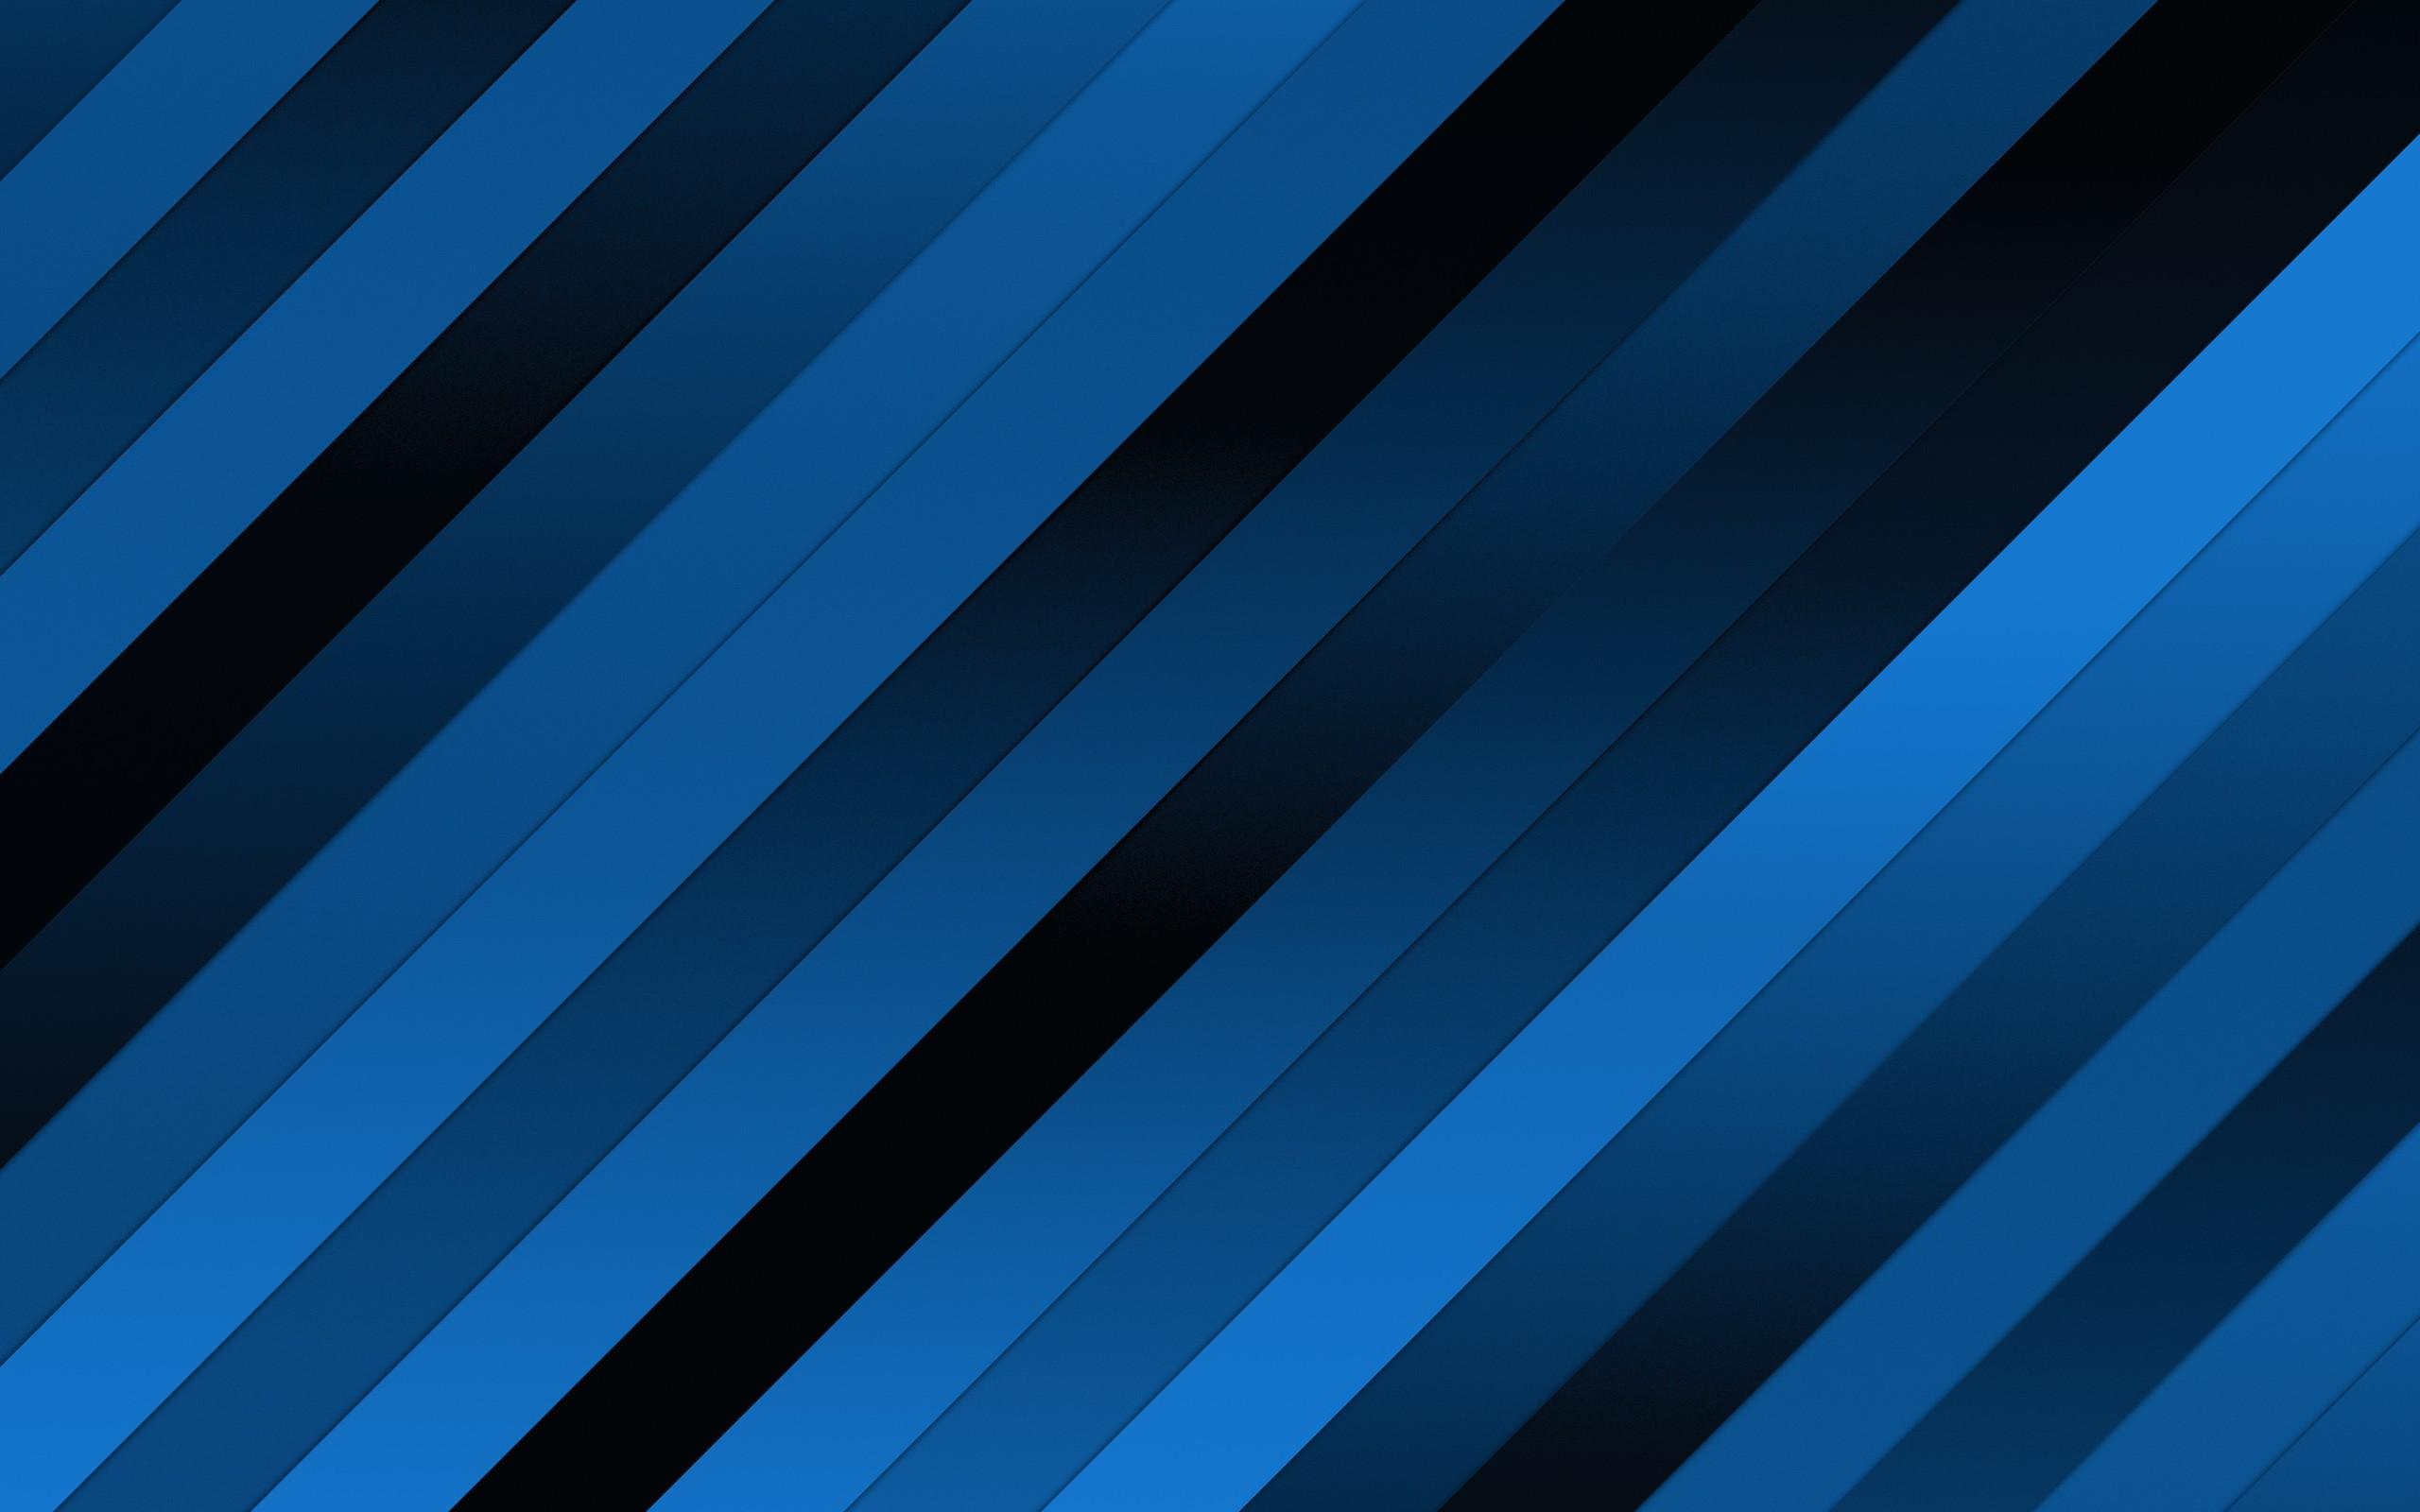 Blue design lines wallpaper